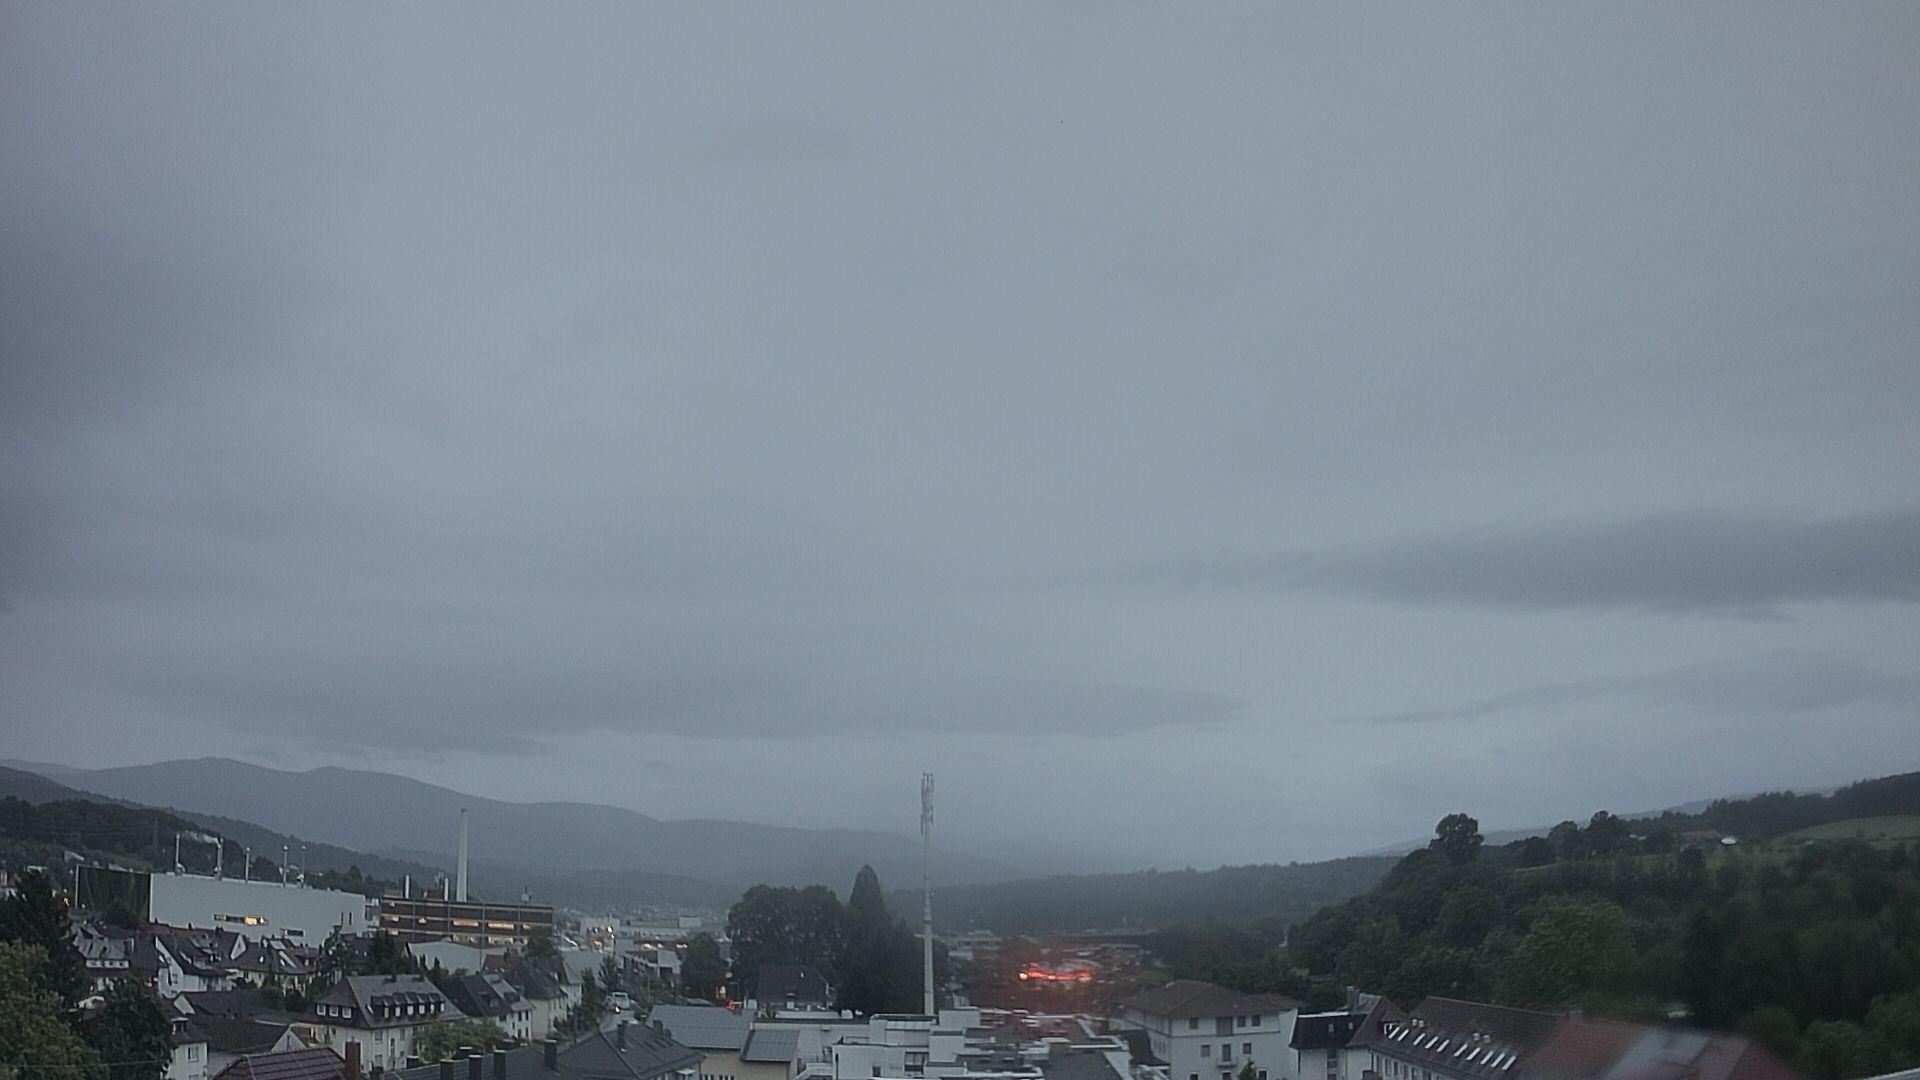 Blick vom Rathaus Richtung Murgtal